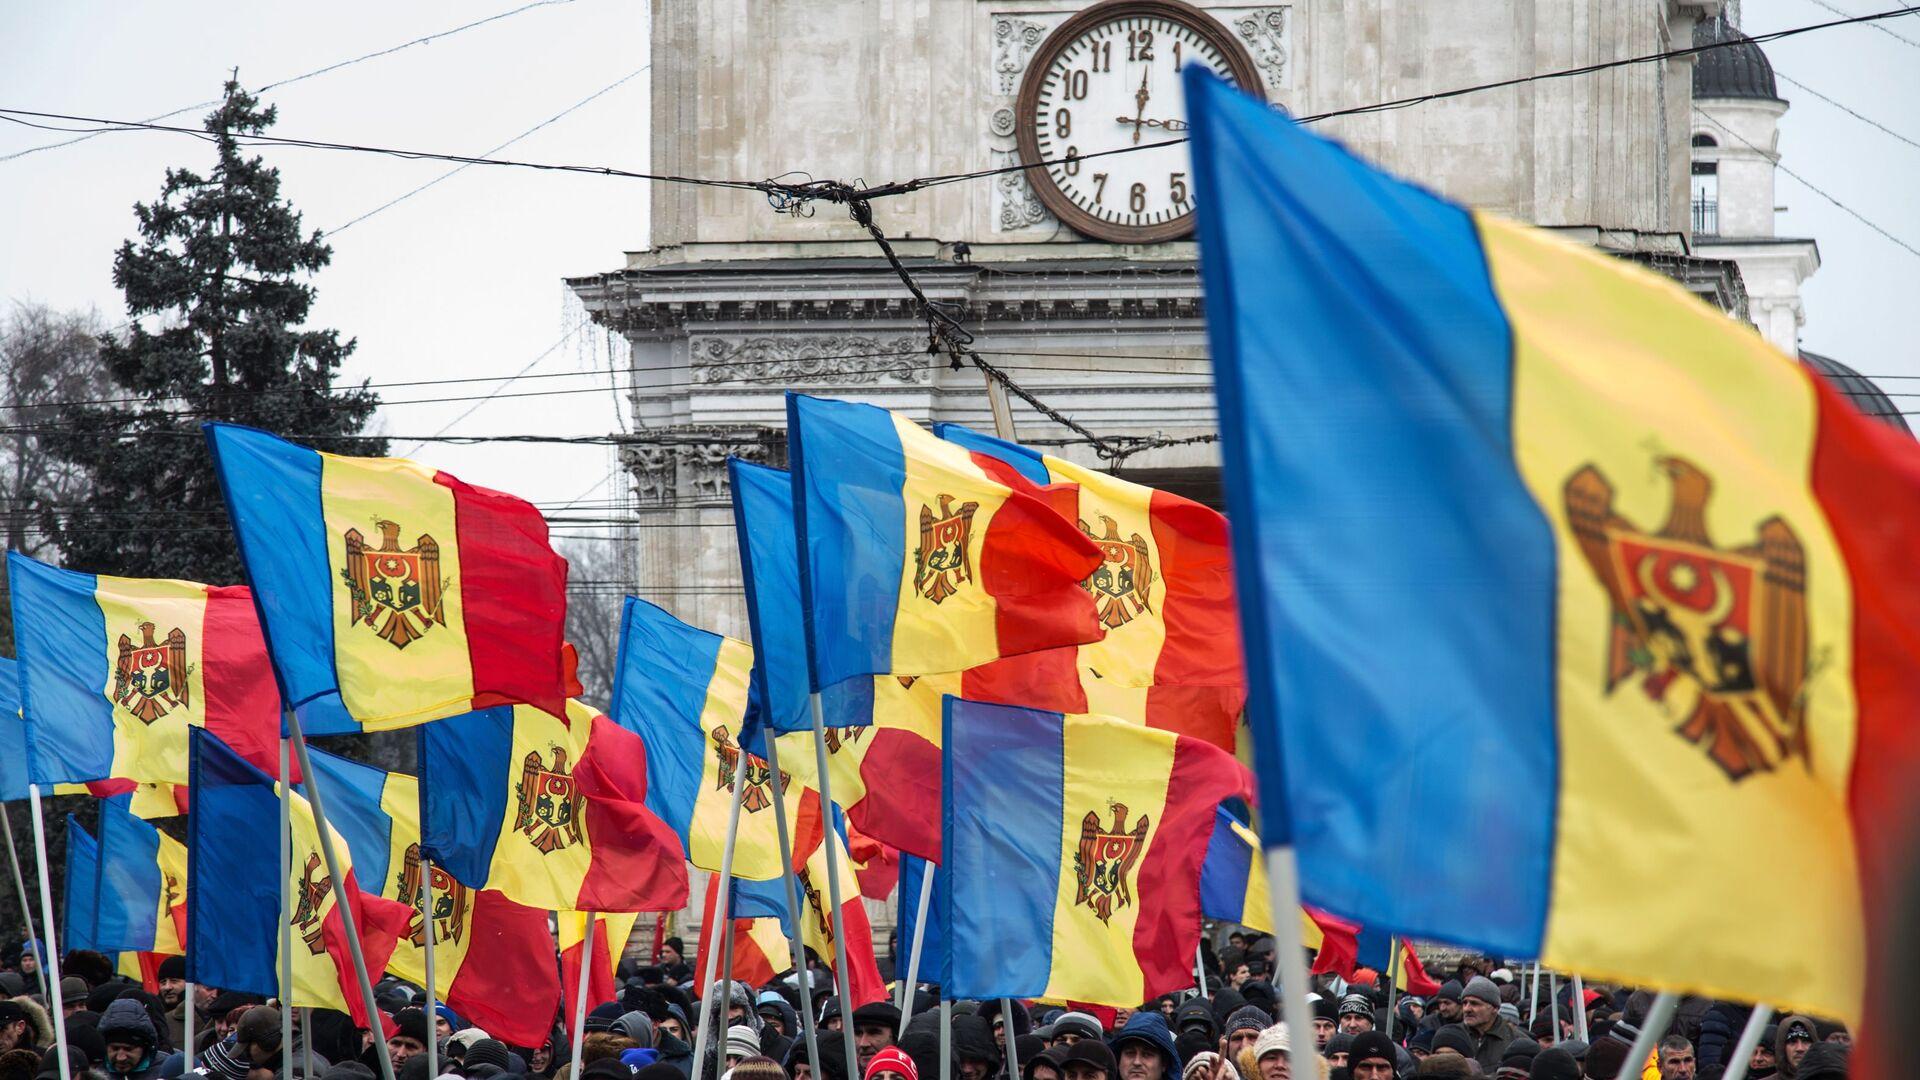 Флаги Молдавии во время акции в Кишиневе - РИА Новости, 1920, 20.10.2020